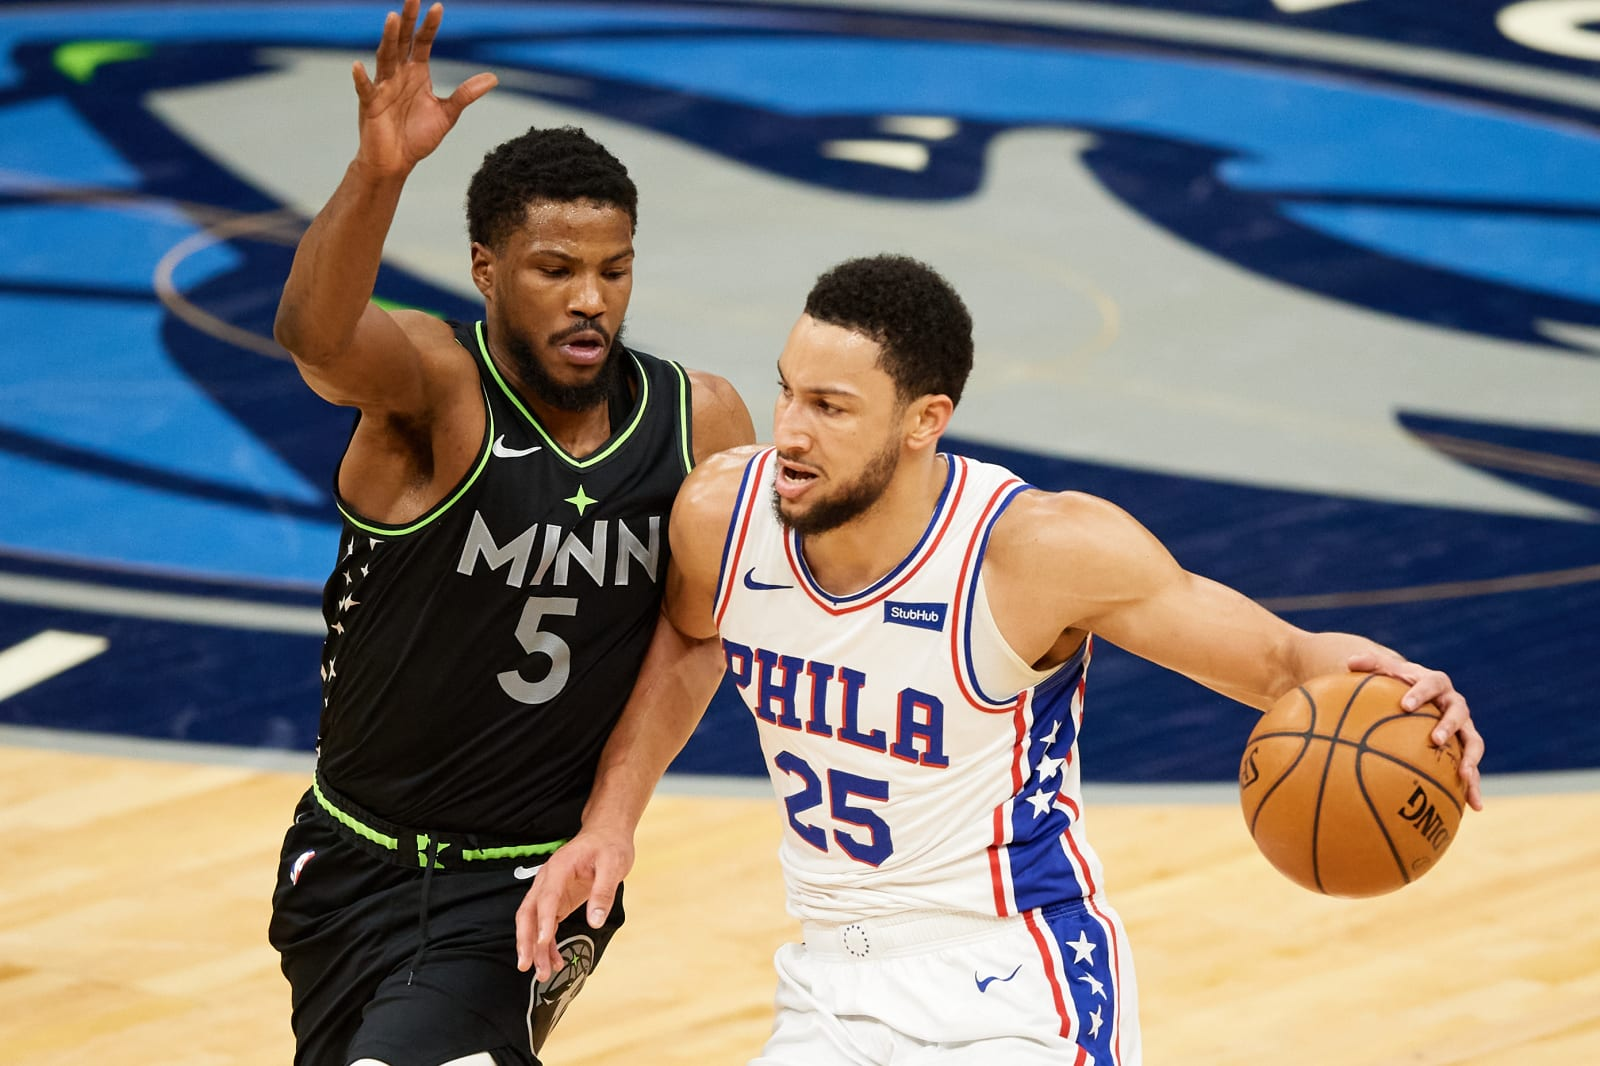 Philadelphia 76ers: Ben Simmons, Minnesota Timberwolves: Malik Beasley